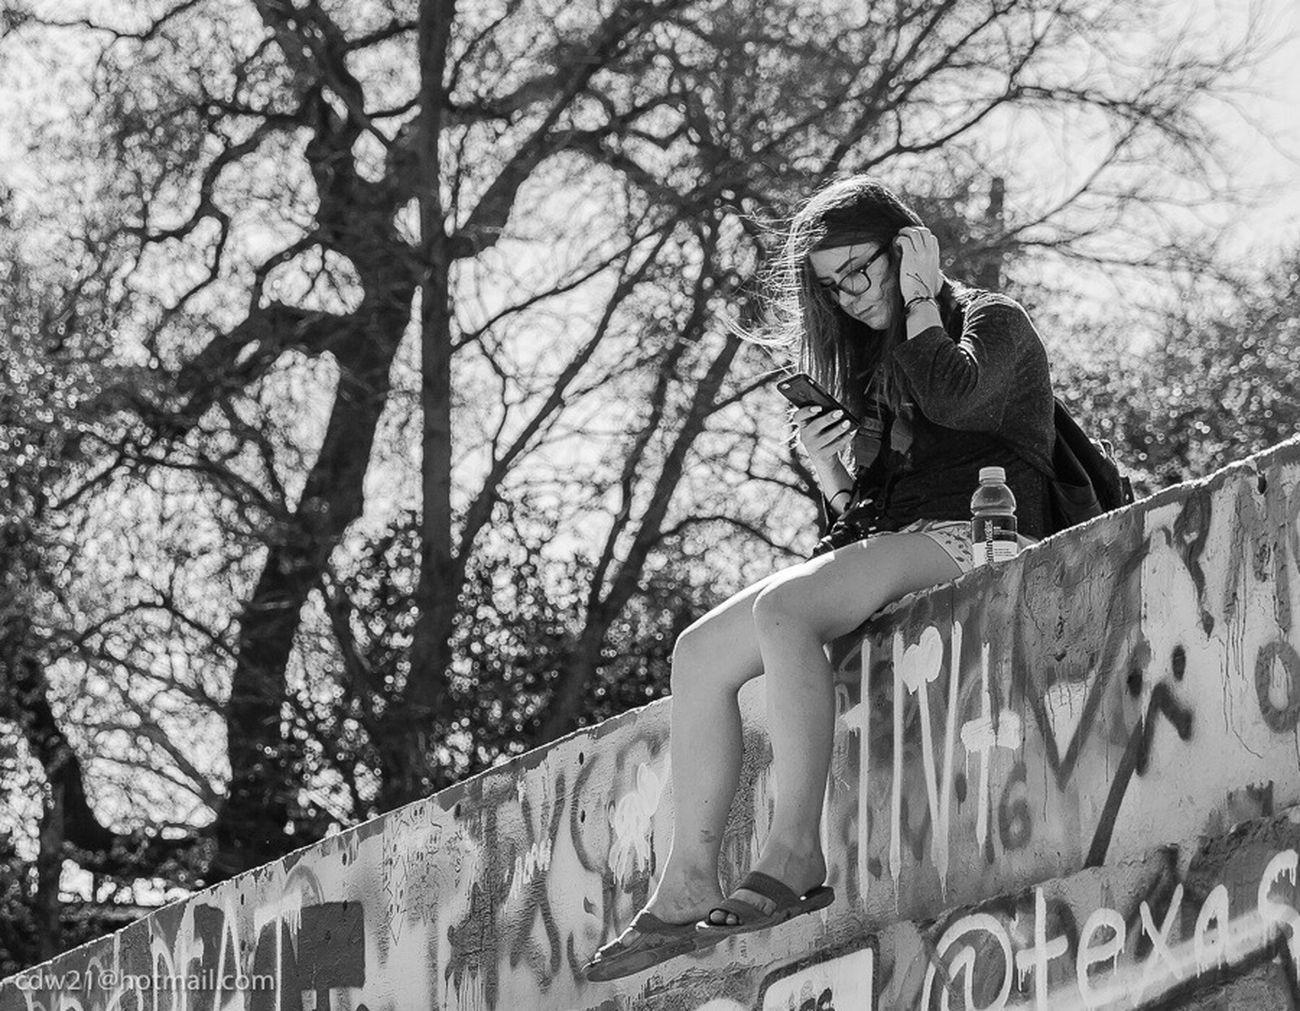 Austin Texas Hopeoutdoorgallery TeamCanon Texaslife Blackandwhite Photography EyeEm Best Shots - Black + White People Of EyeEm Blackandwhitephoto People Watching Peoplephotography EyeEm Black&white! EyeEmTexas